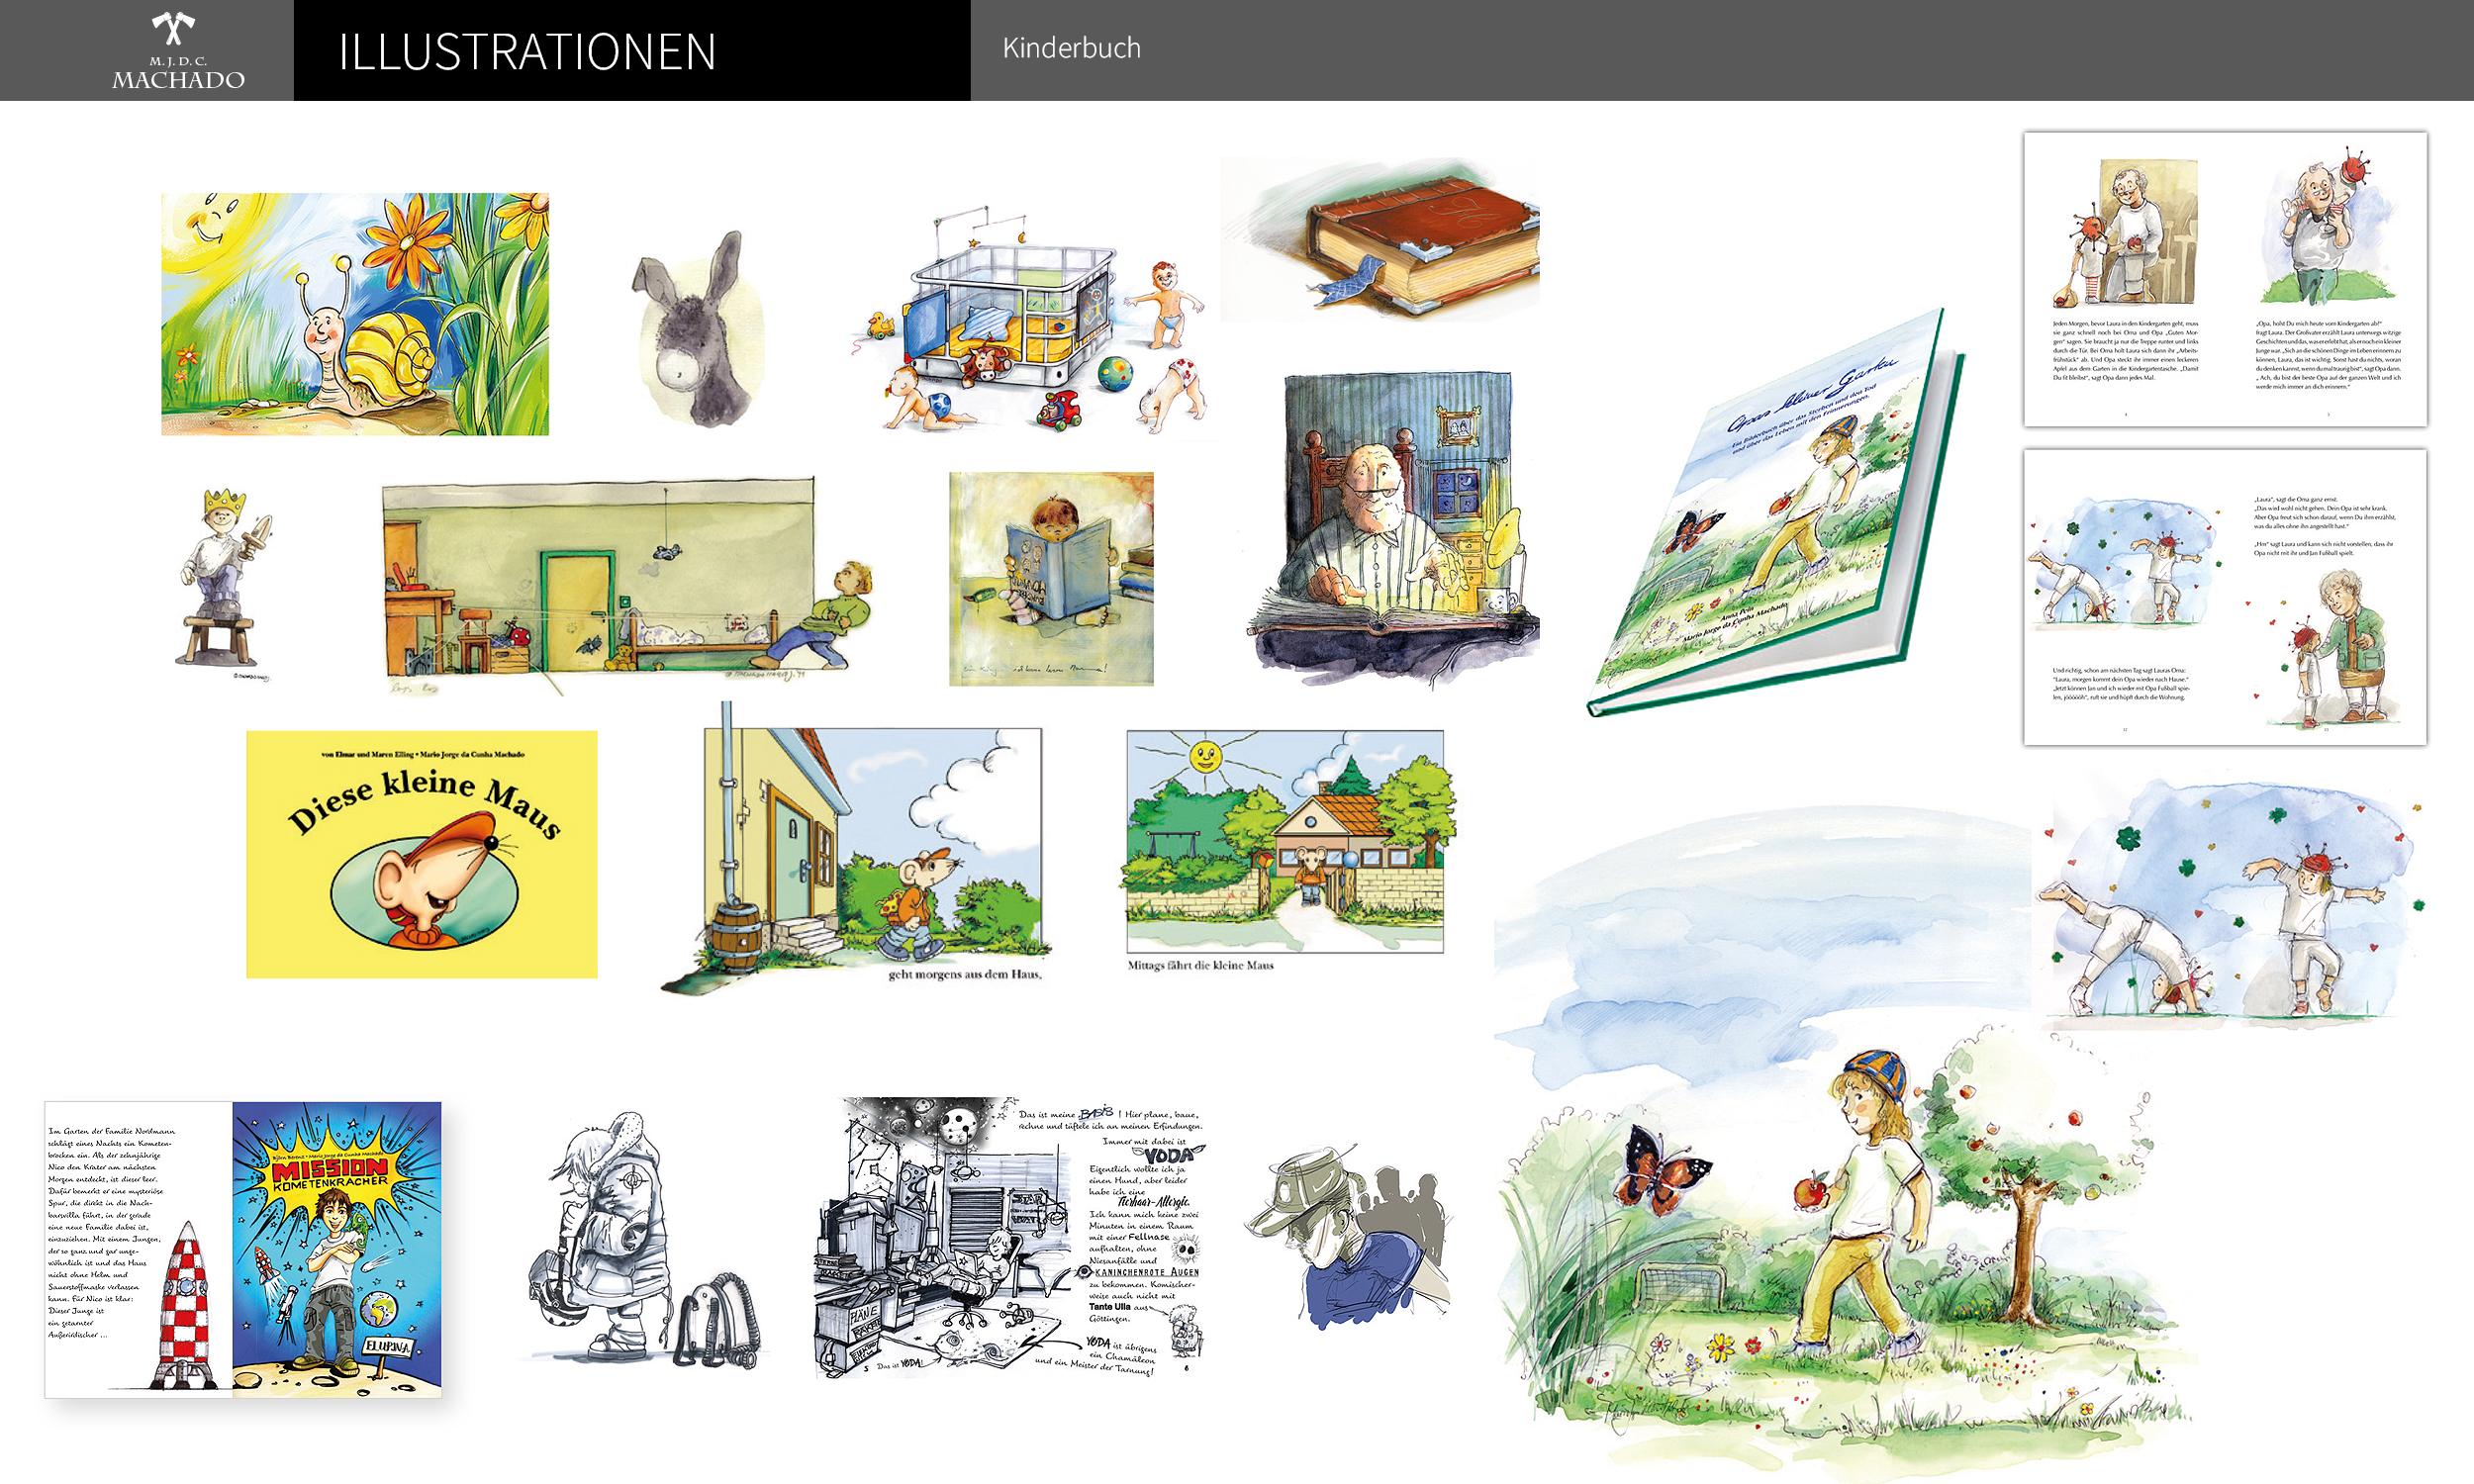 Auswahl an Illustrationen